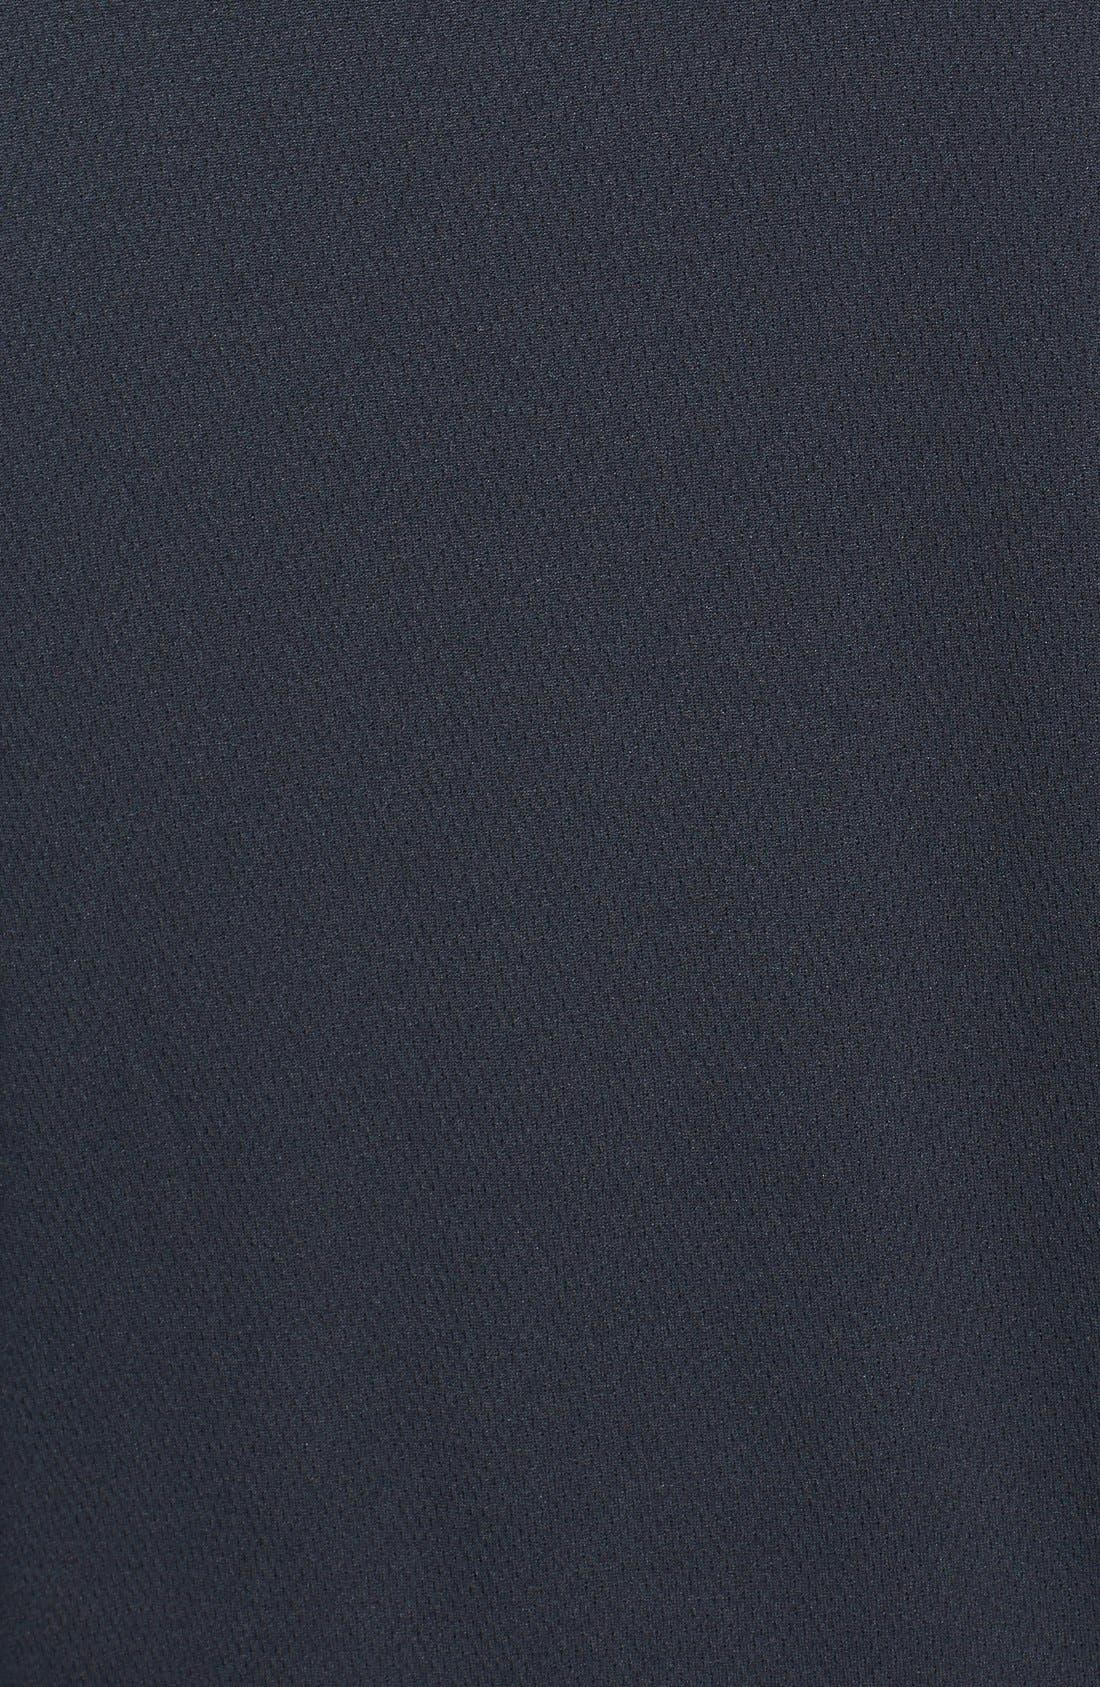 San Francisco 49ers - Edge DryTec Moisture Wicking Half Zip Pullover,                             Alternate thumbnail 3, color,                             001